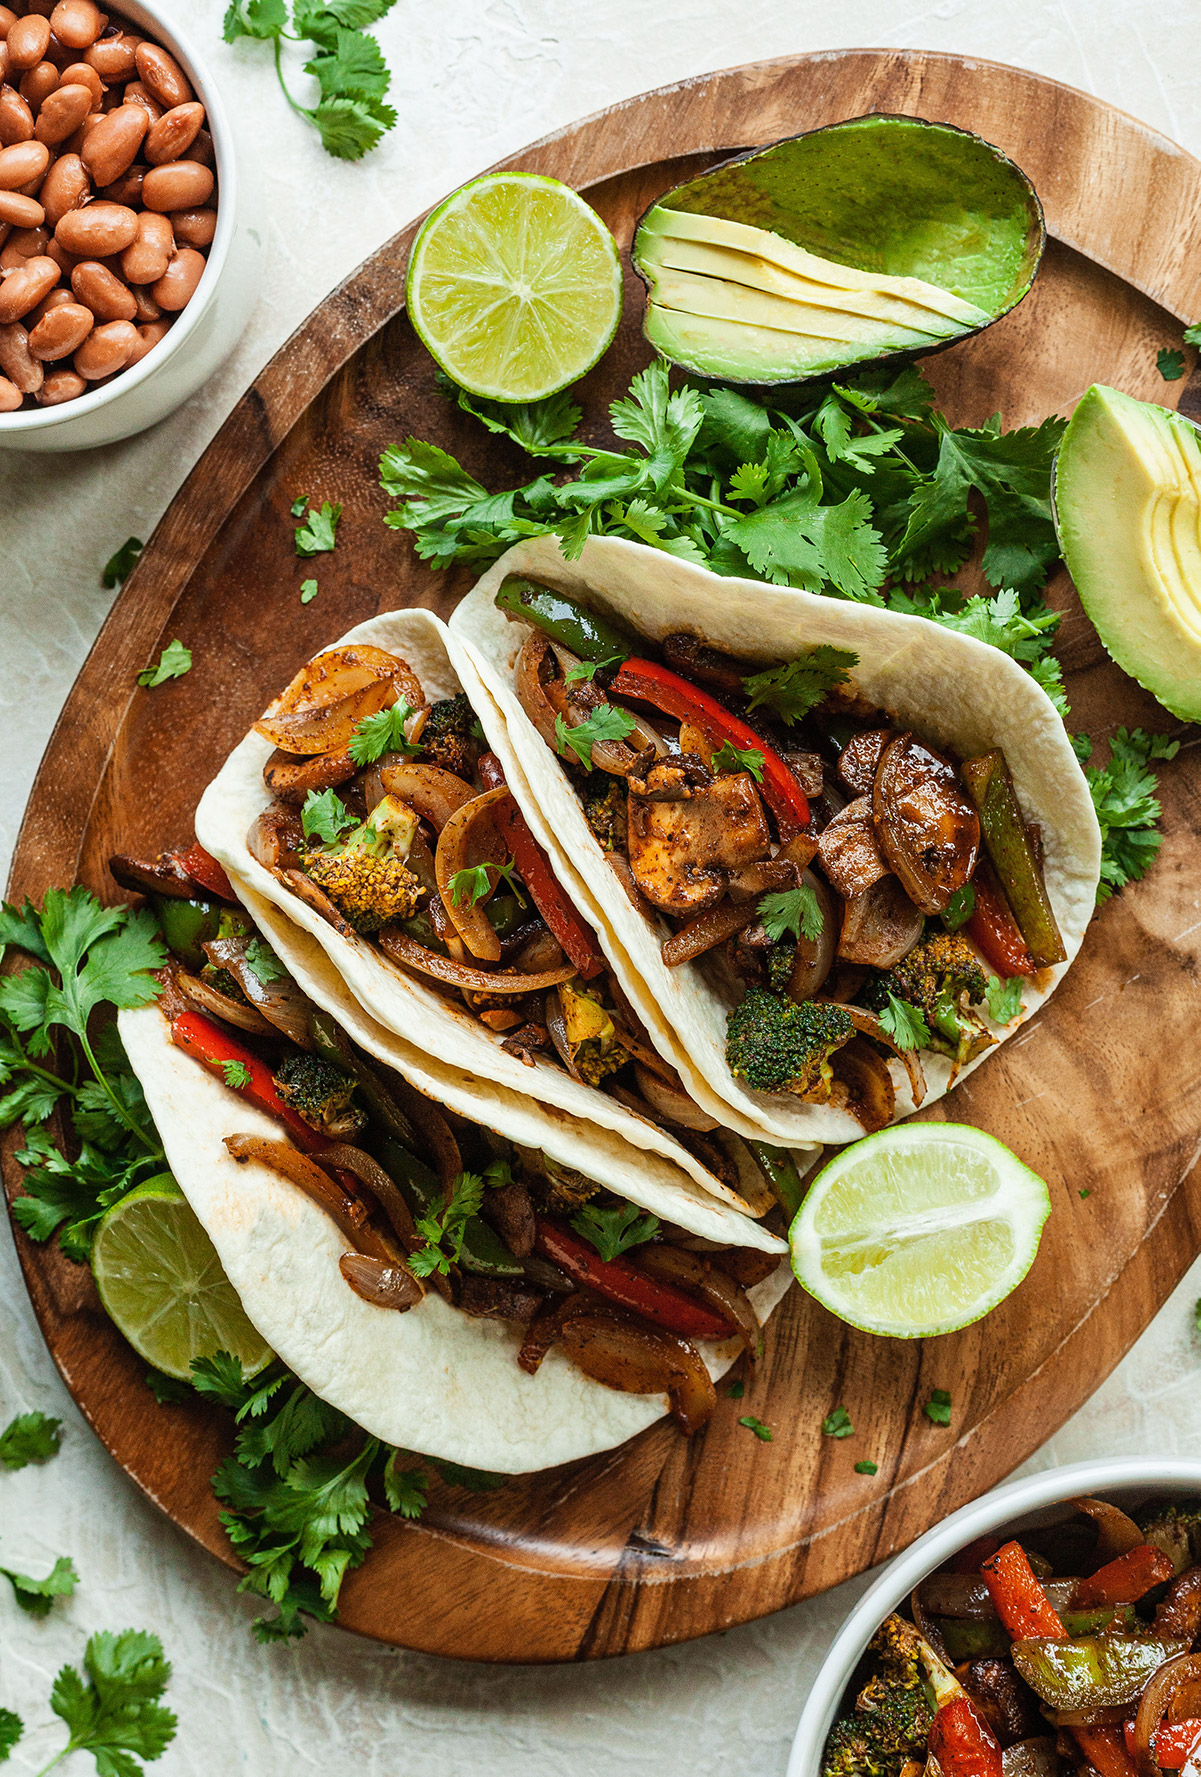 three vegan fajitas on a platter with limes, avocado, and cilantro